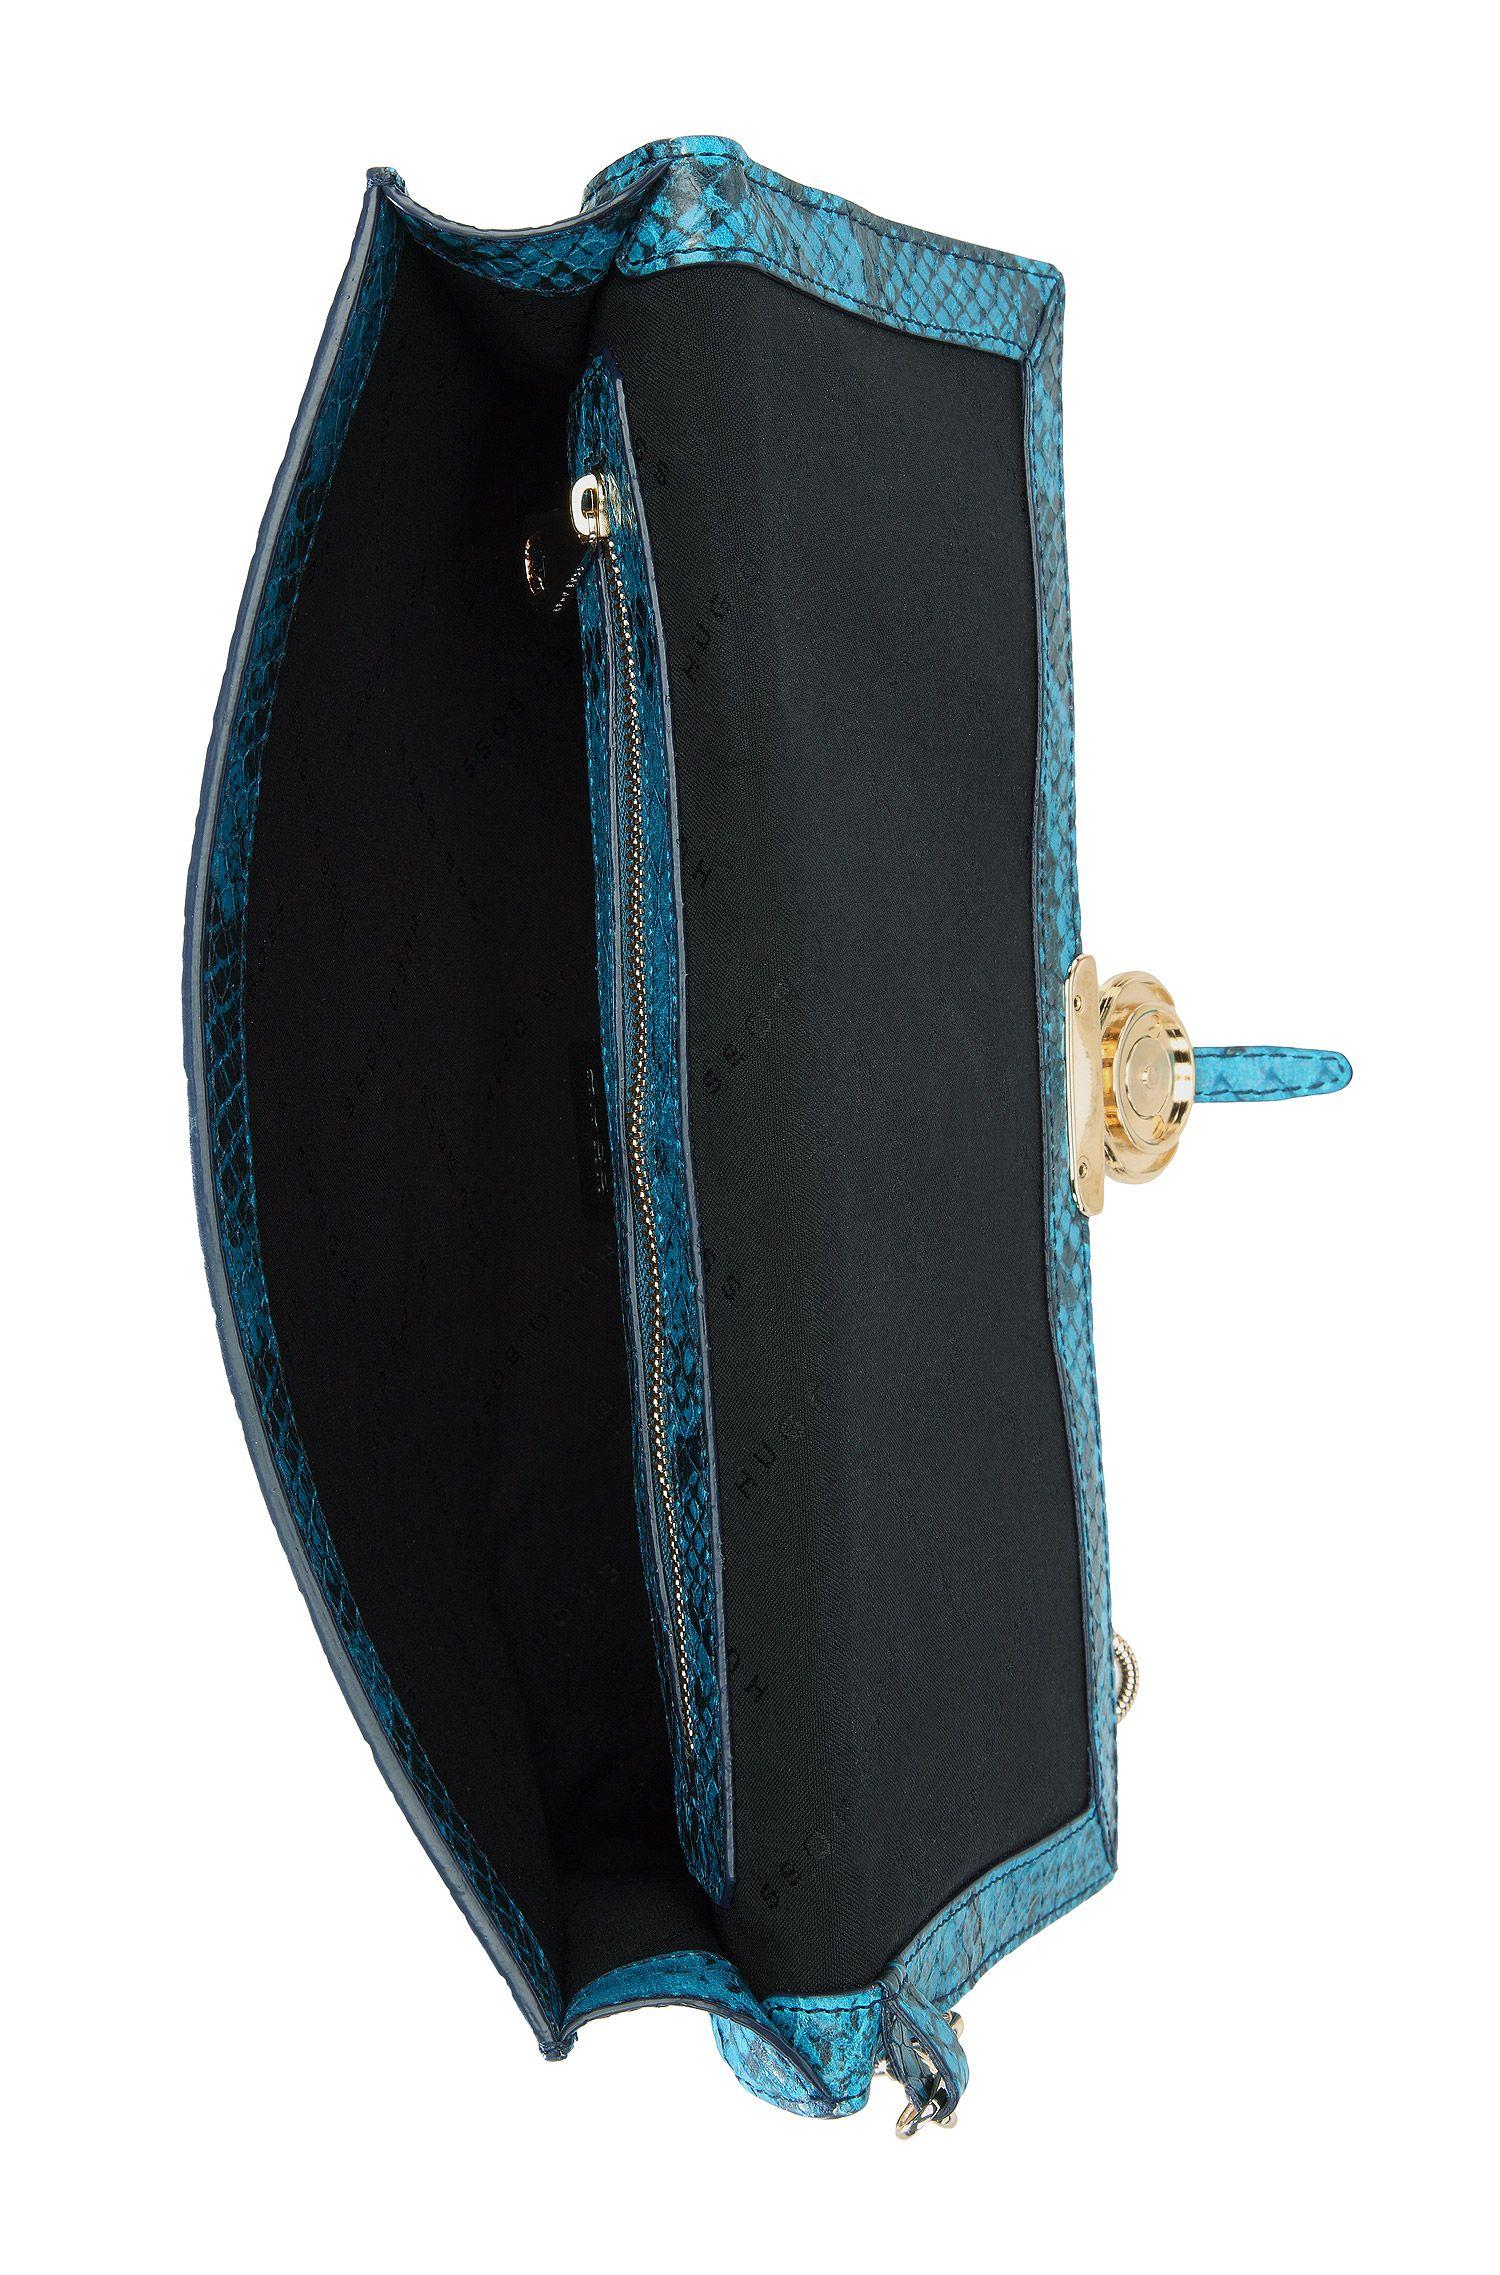 Clutch-Bag ´Caledony-P` aus Rindsleder